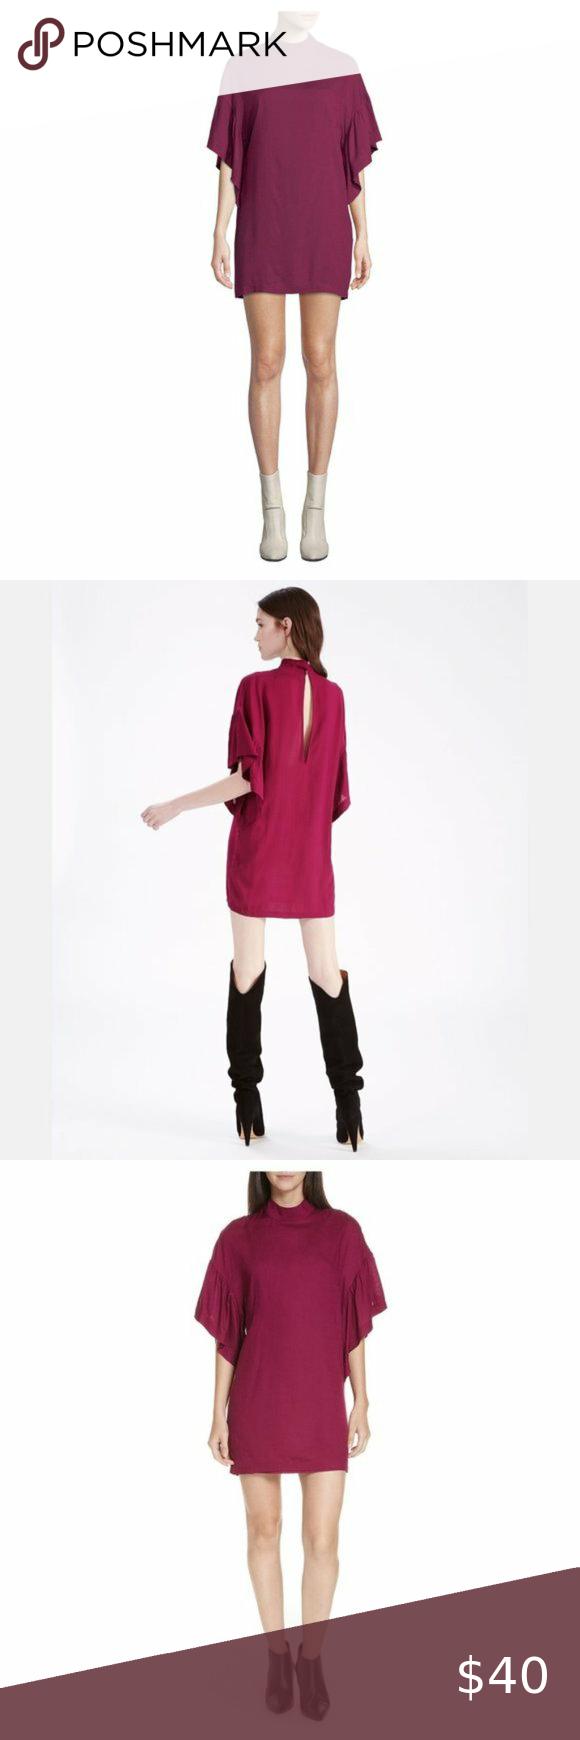 Iro Nwt Theifya Cape Sleeve Mock Neck Shift Dress Shift Dress Ruffle Sleeve Dress Dresses With Sleeves [ 1740 x 580 Pixel ]